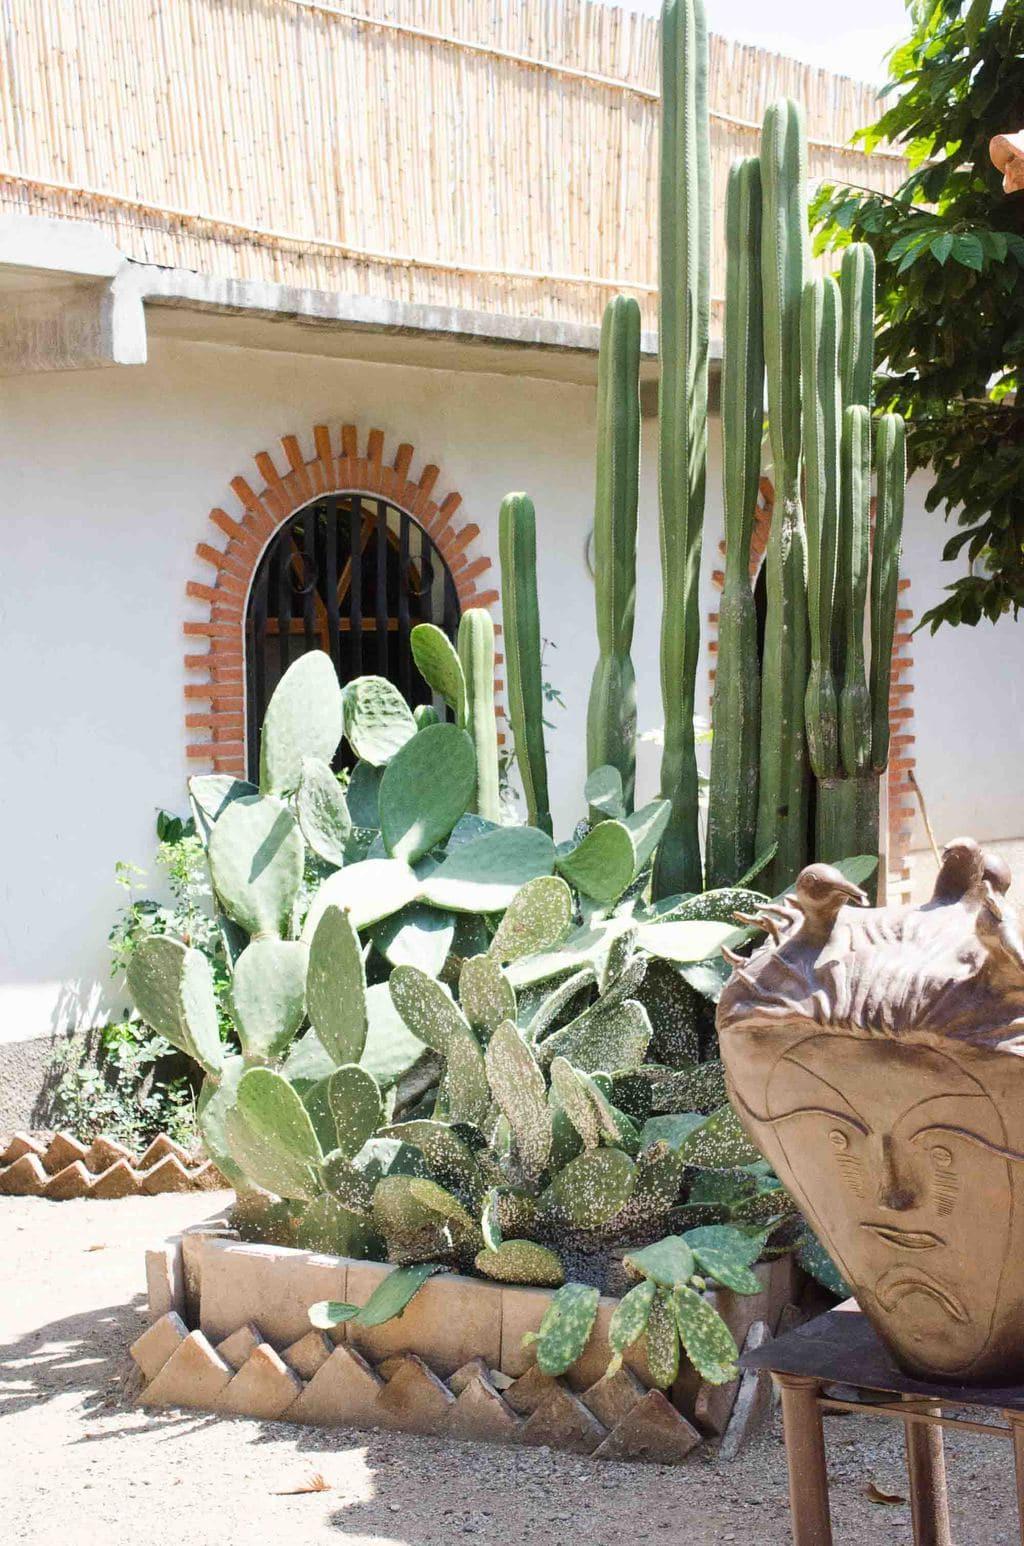 Cactus in Oaxaca, Mexico